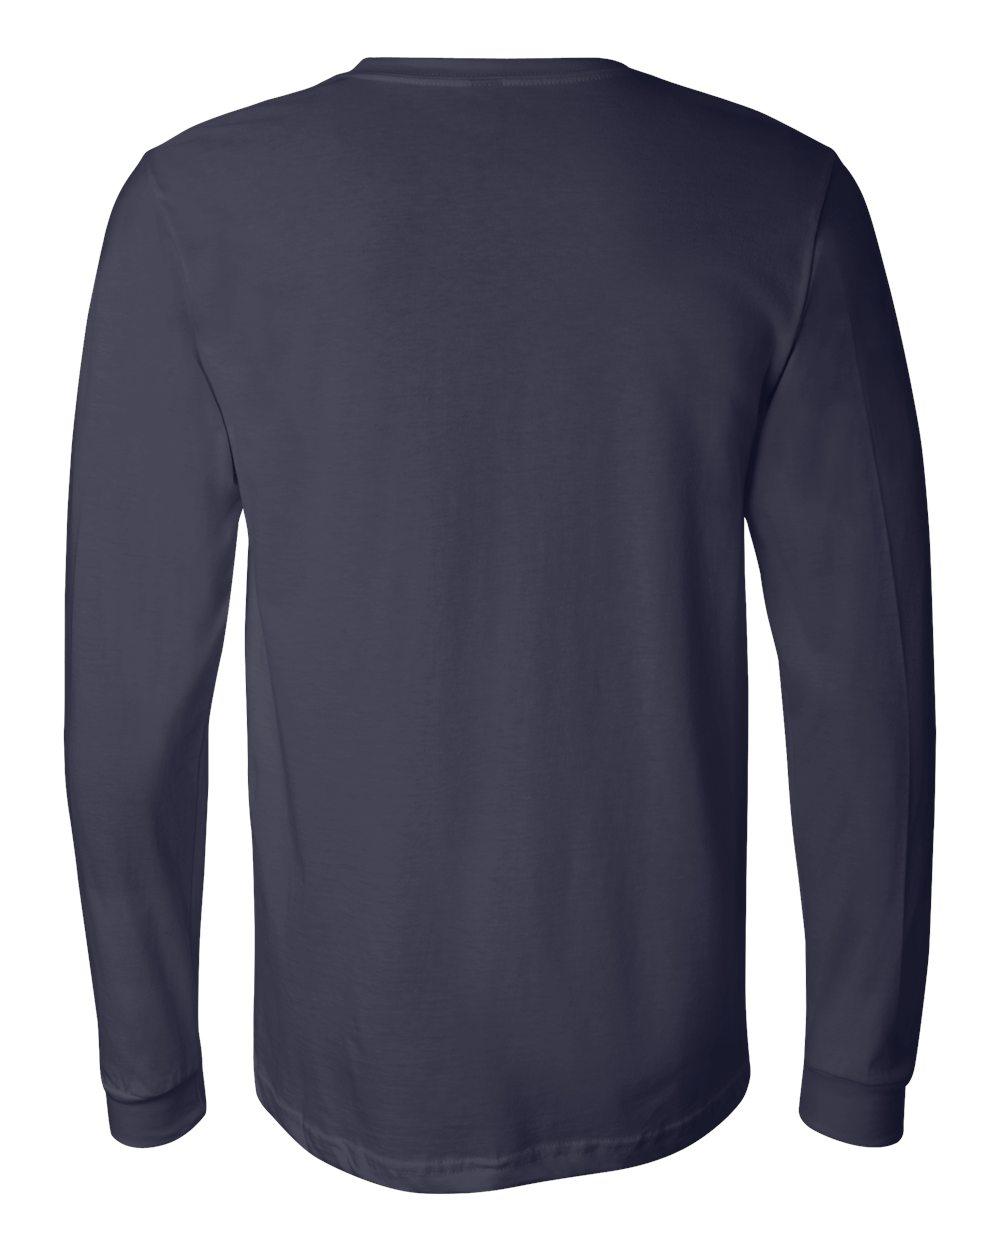 Bella-Canvas-Mens-Blank-Top-Long-Sleeve-Jersey-Tee-T-Shirt-3501-up-to-3XL thumbnail 89